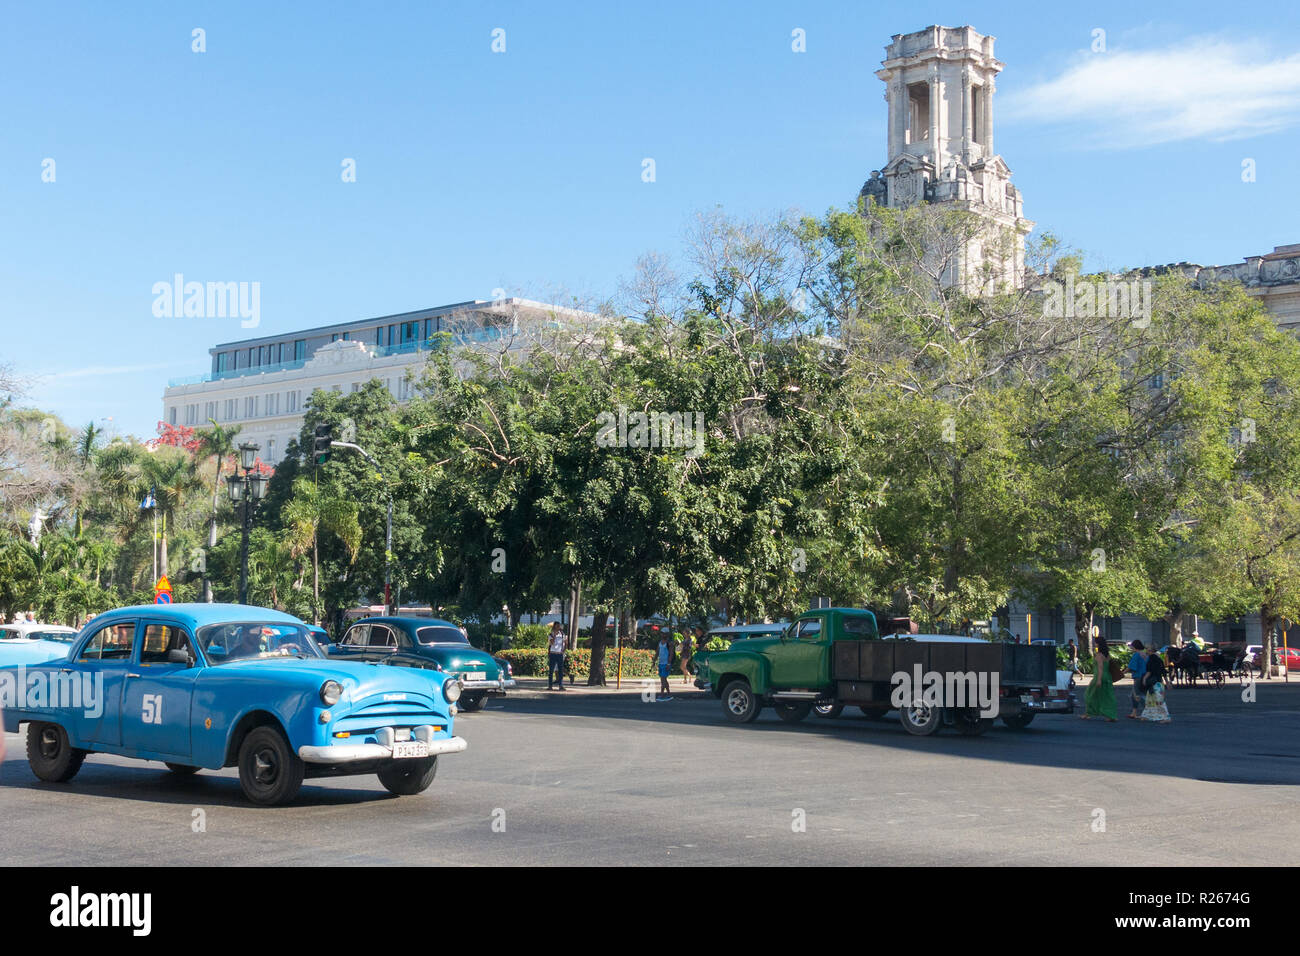 HAVANA, CUBA - JANUARY 16, 2017: Street scene with old american car in downtown Havana, Cuba Stock Photo